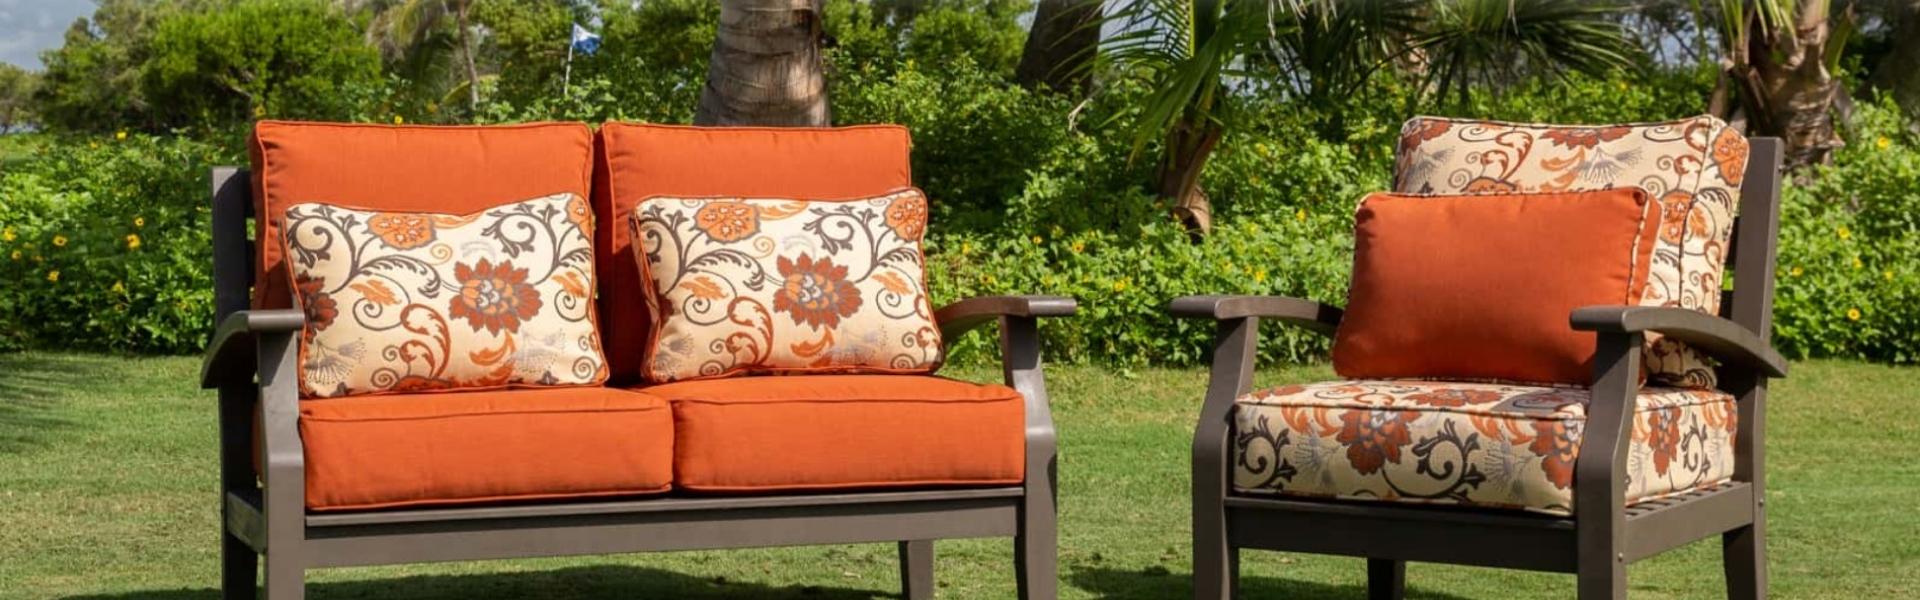 classic cushions patio furniture